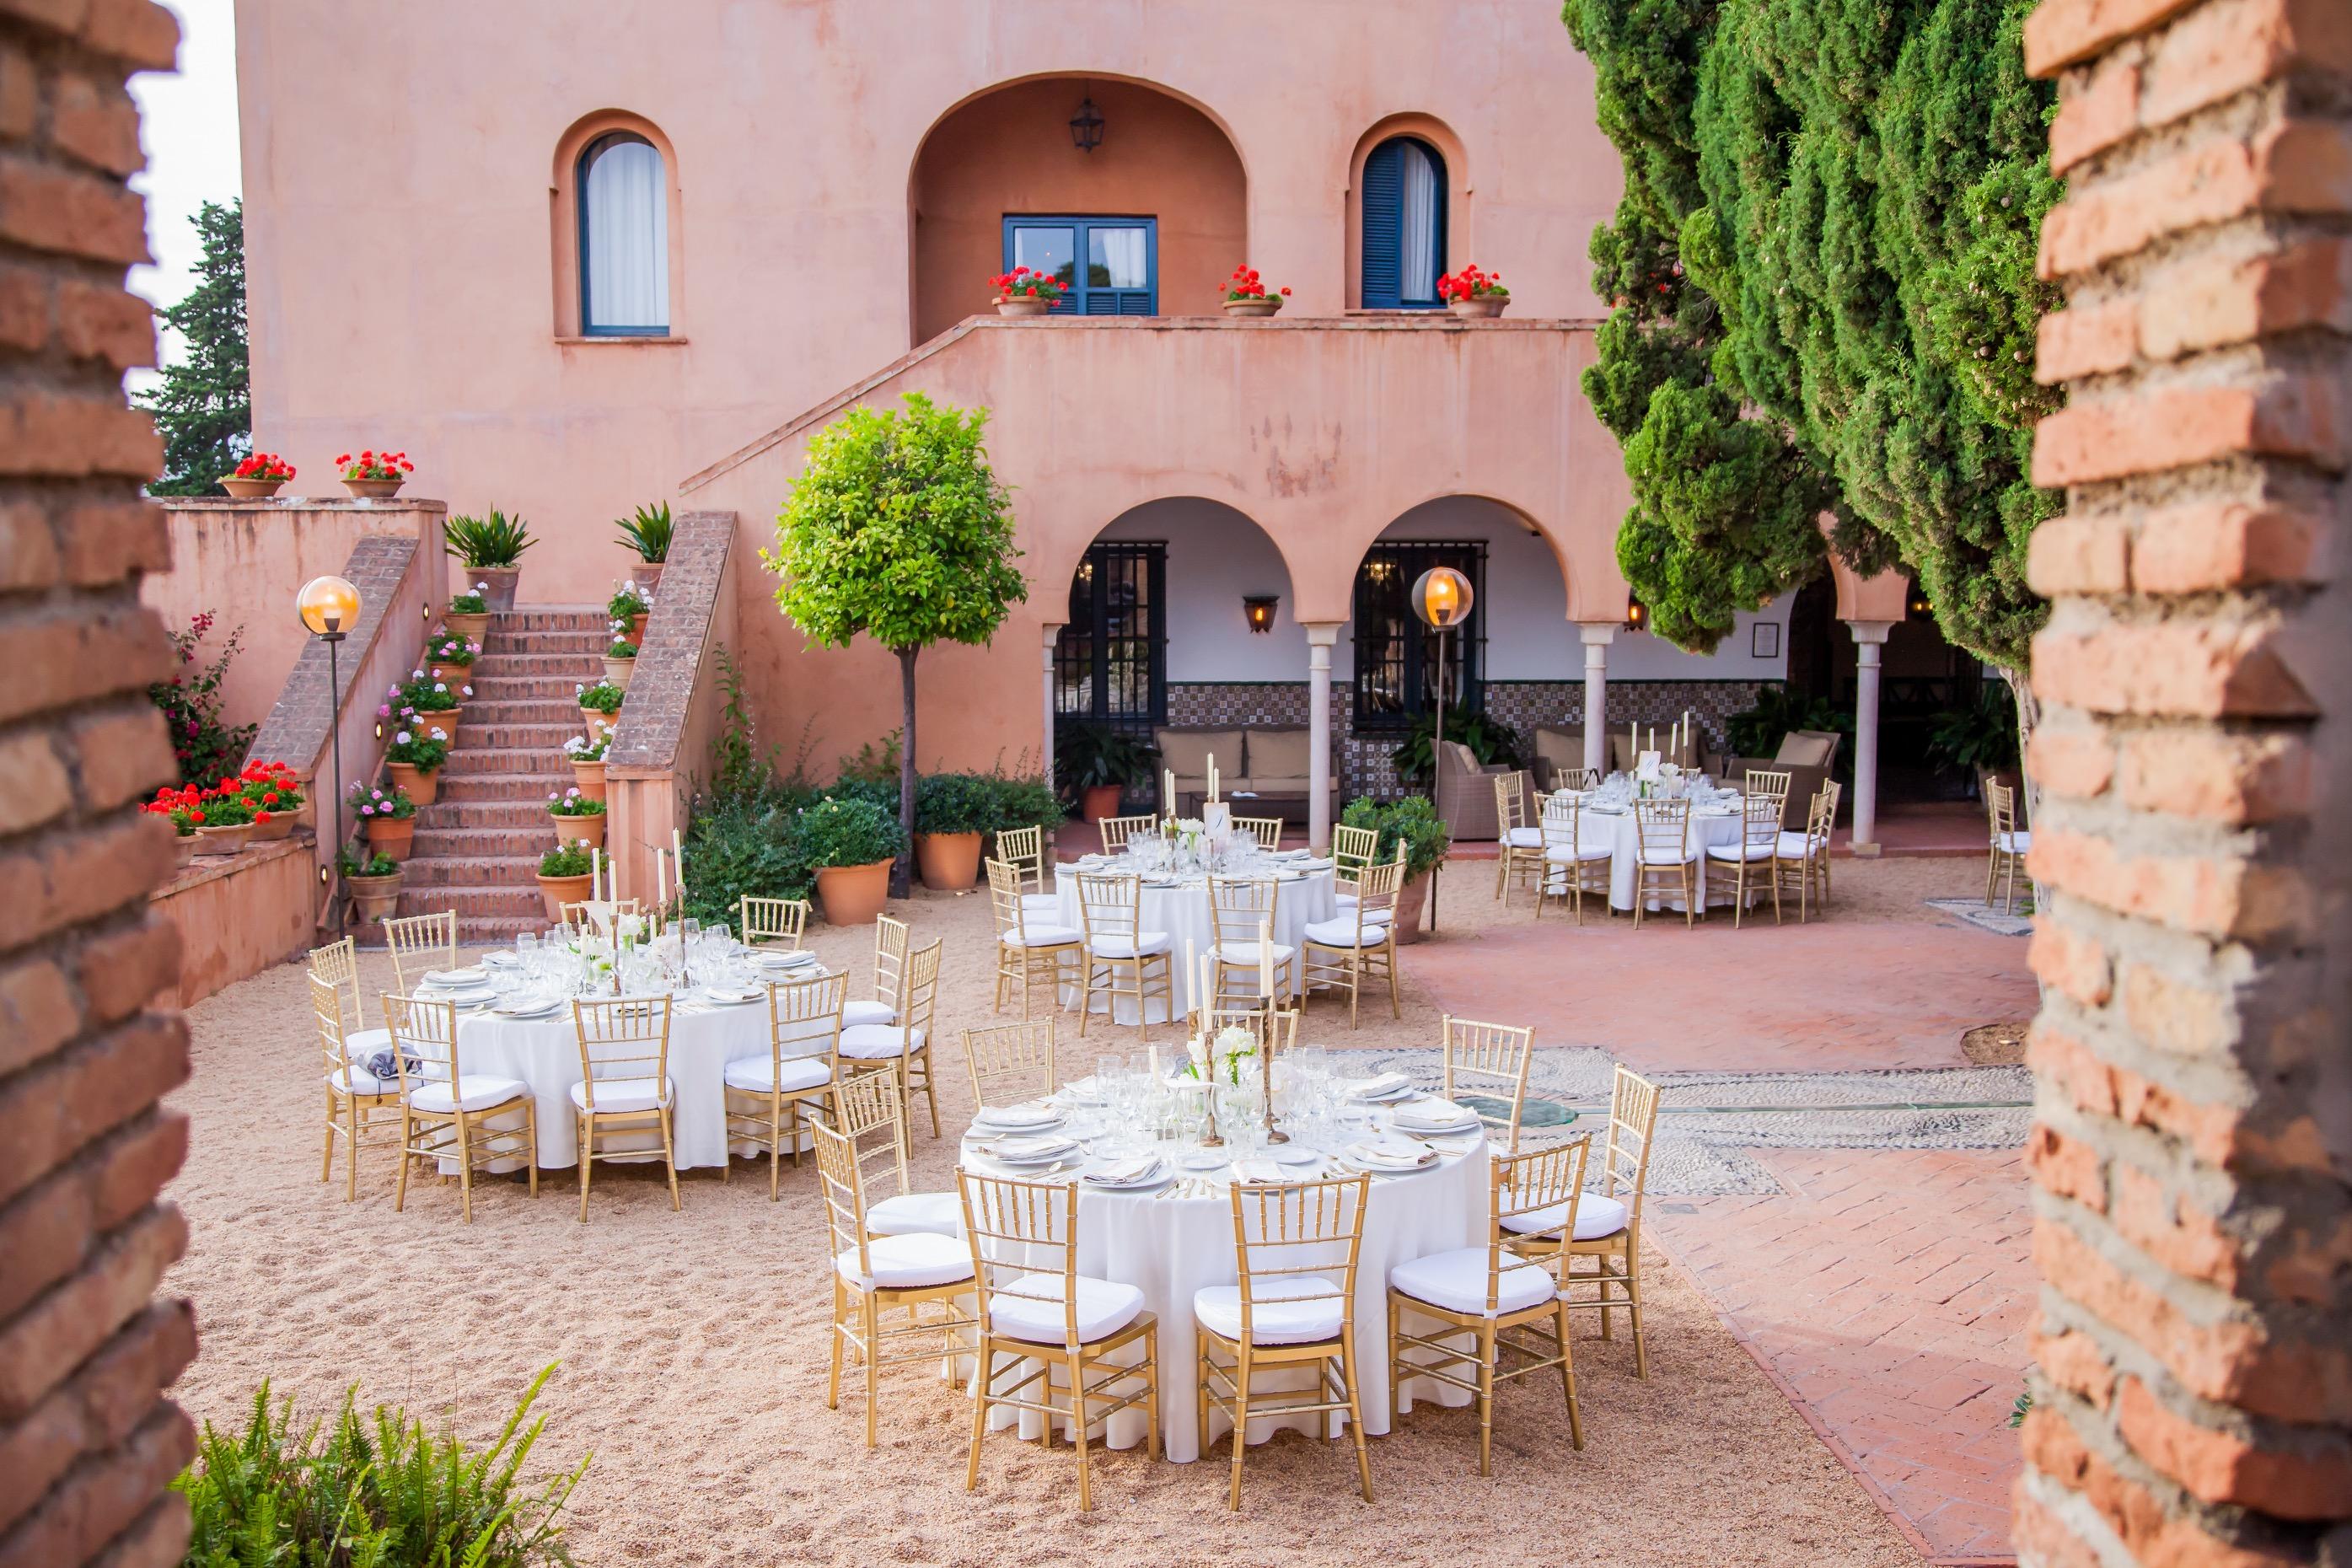 Si-Quiero-Wedding-Planner-By-Sira-Antequera-Bodas-Málaga-Marbella-Miami-000